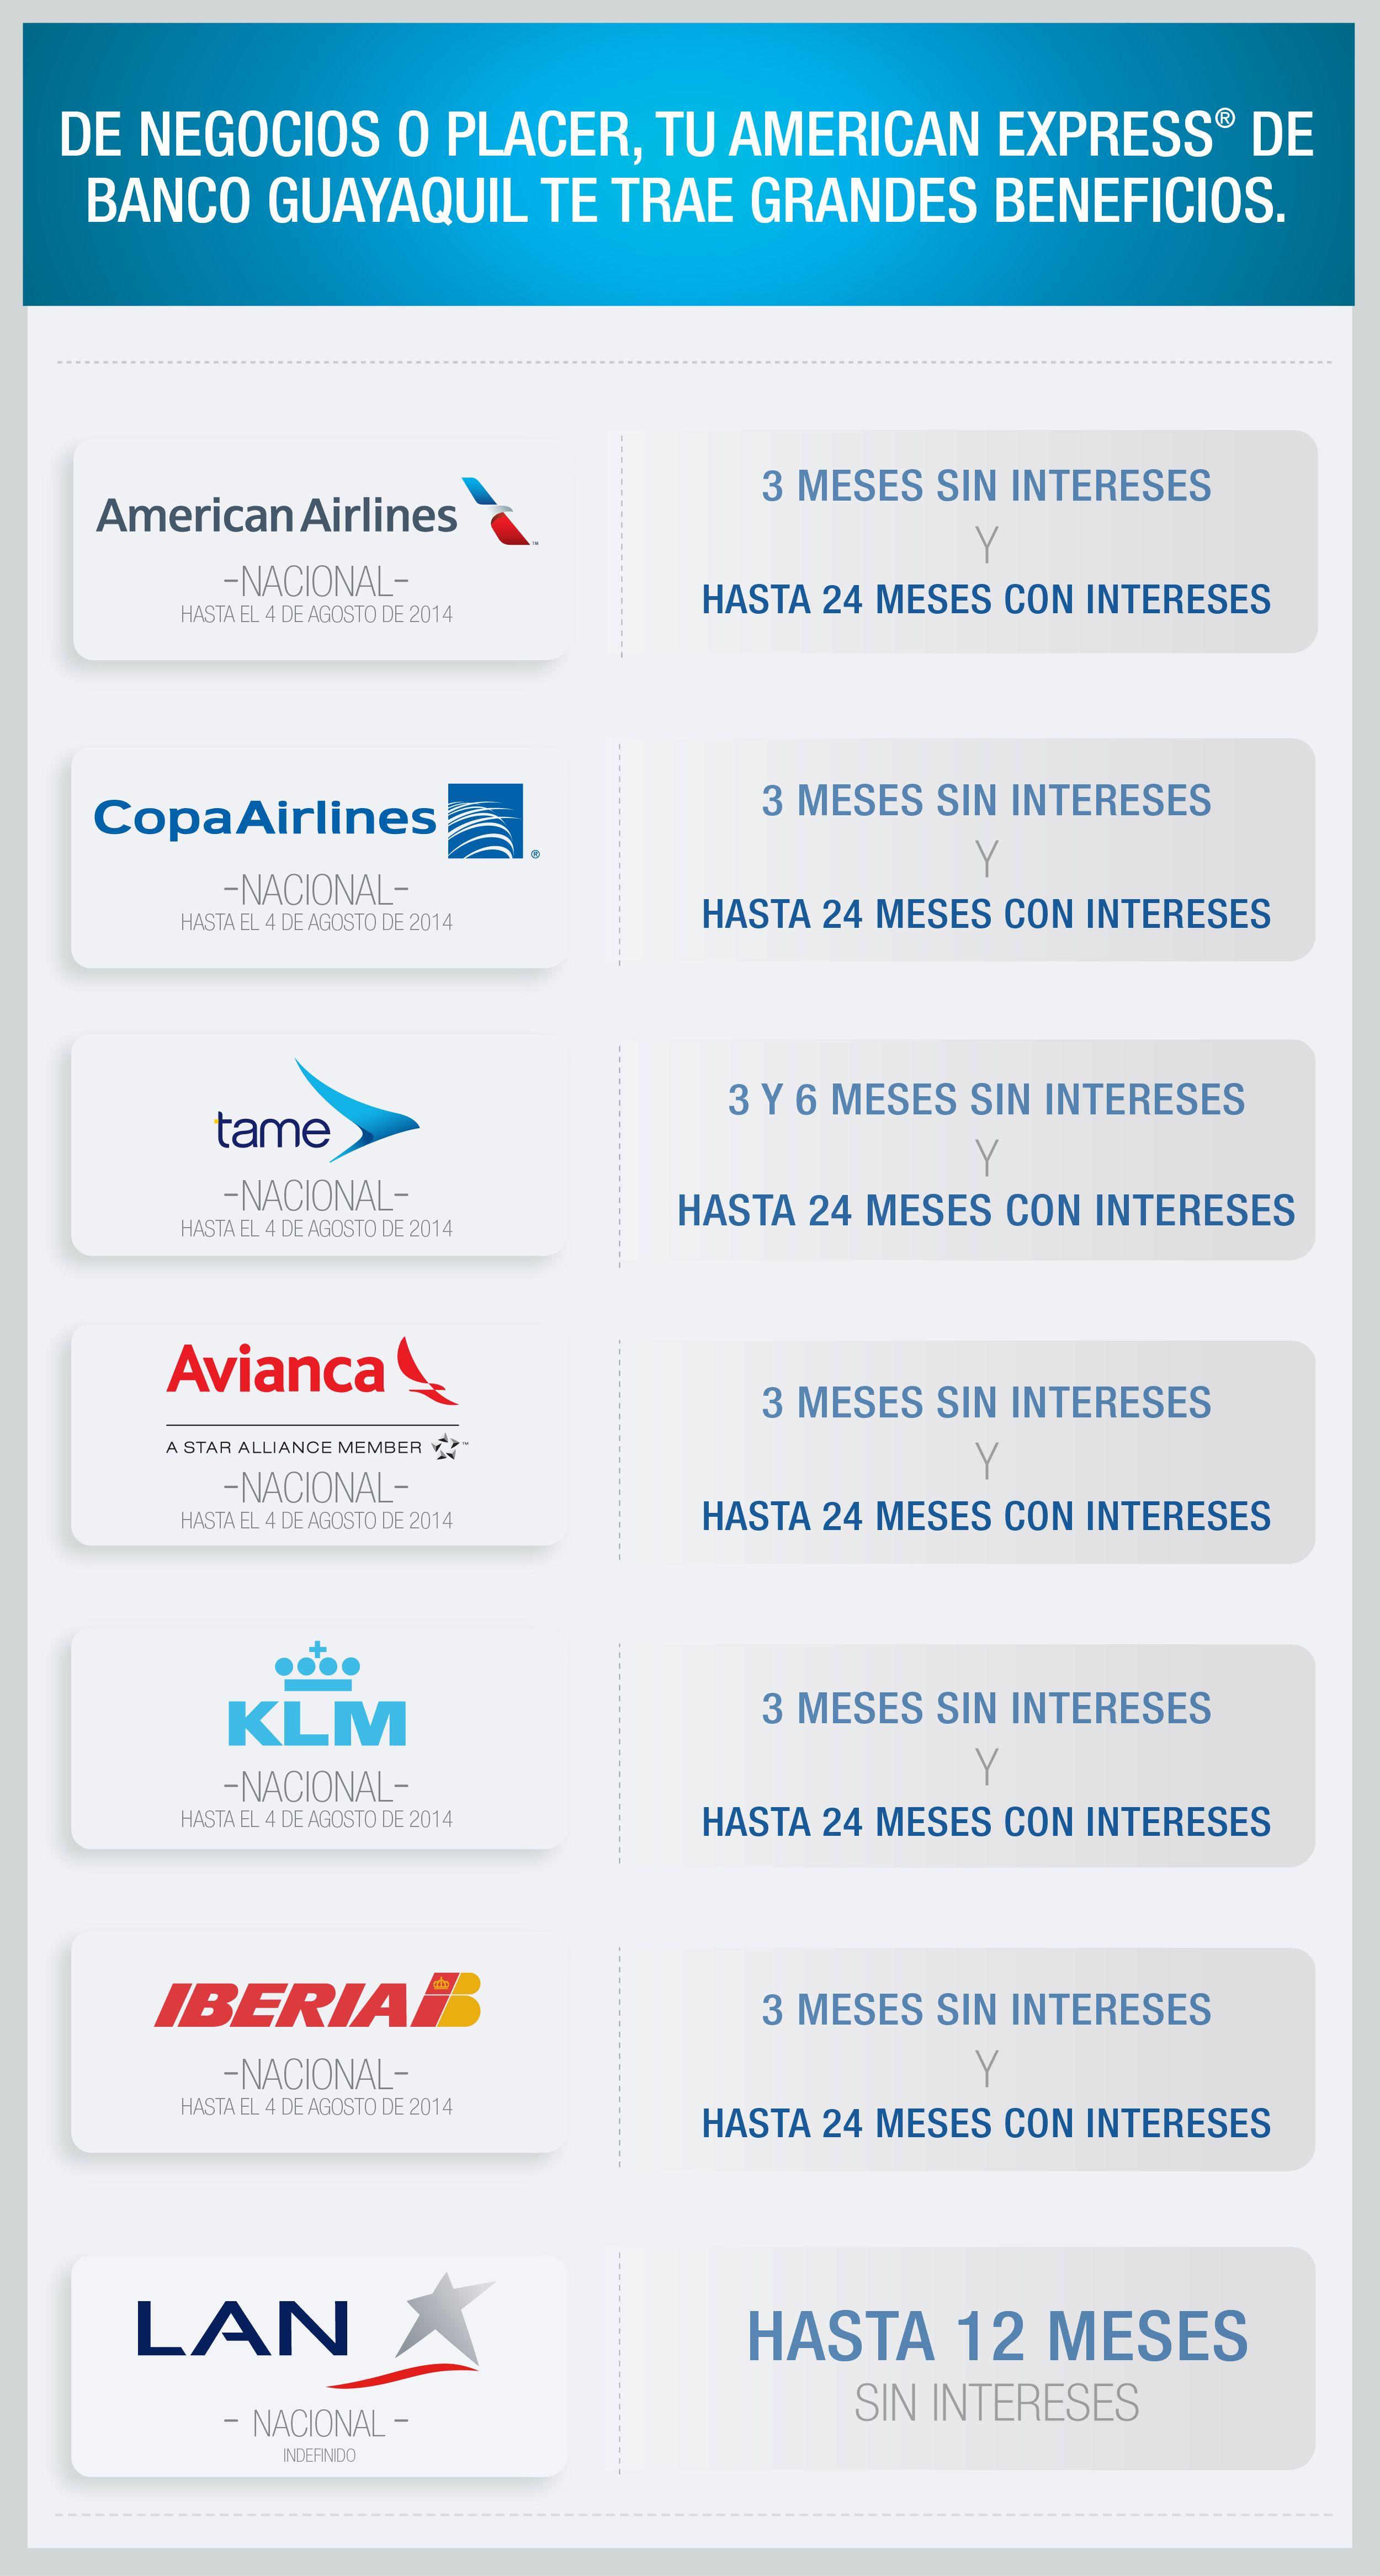 De Negocios O Placer Tu American Express De Banco Guayaquil Te